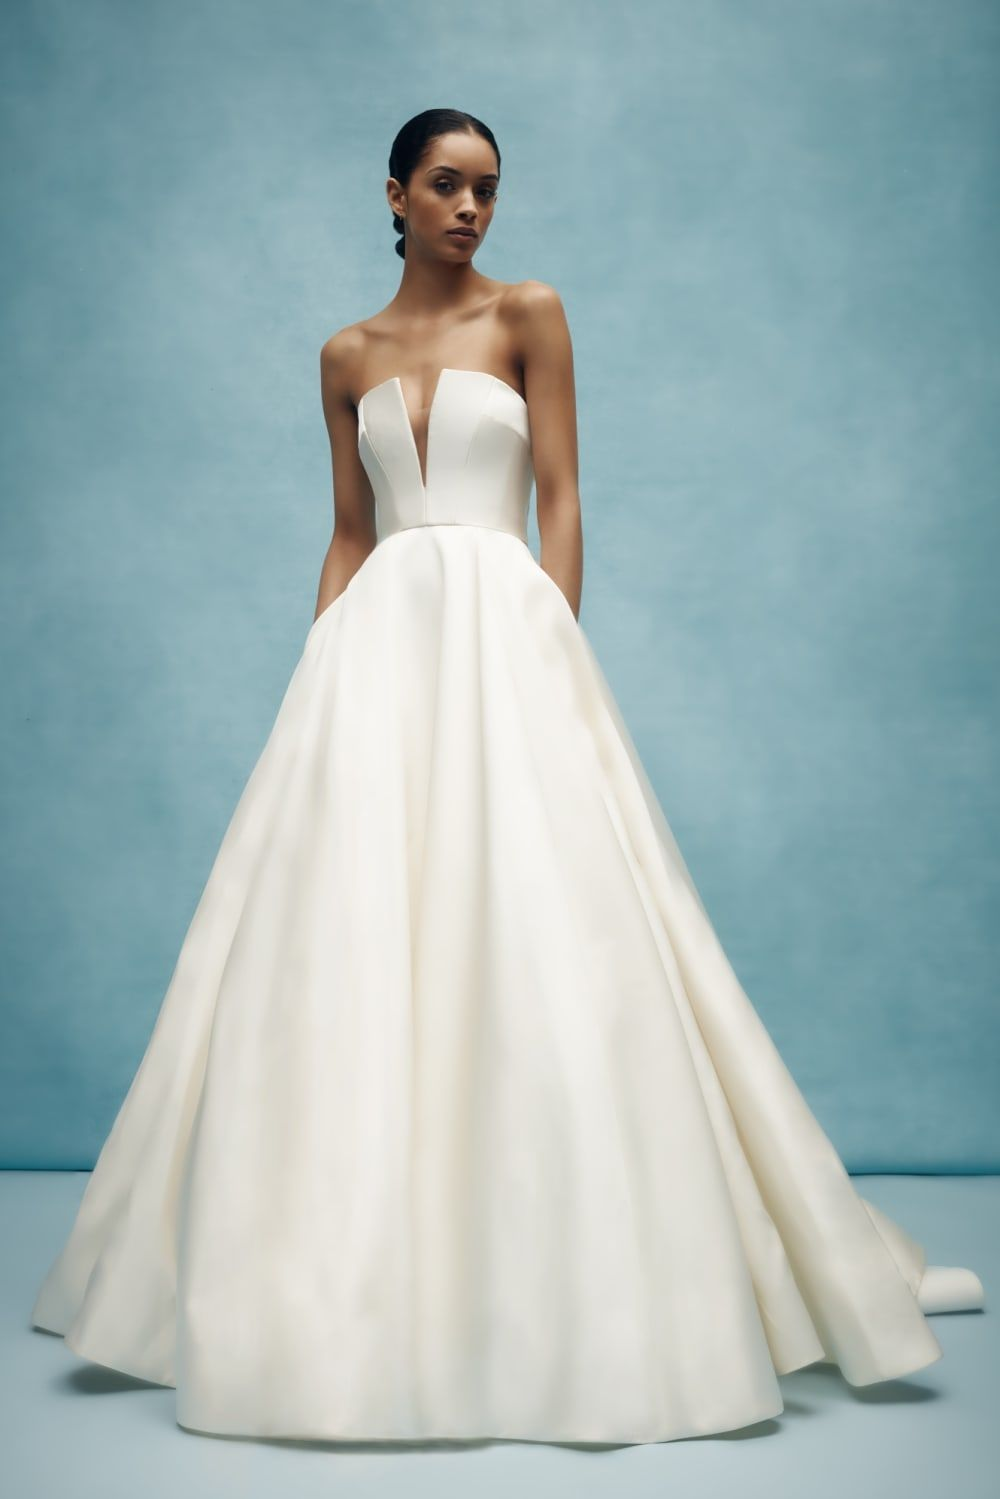 Ballgown Wedding Dresses Dress For The Wedding Anne Barge Wedding Dresses Wedding Dress With Pockets Ball Gowns Wedding